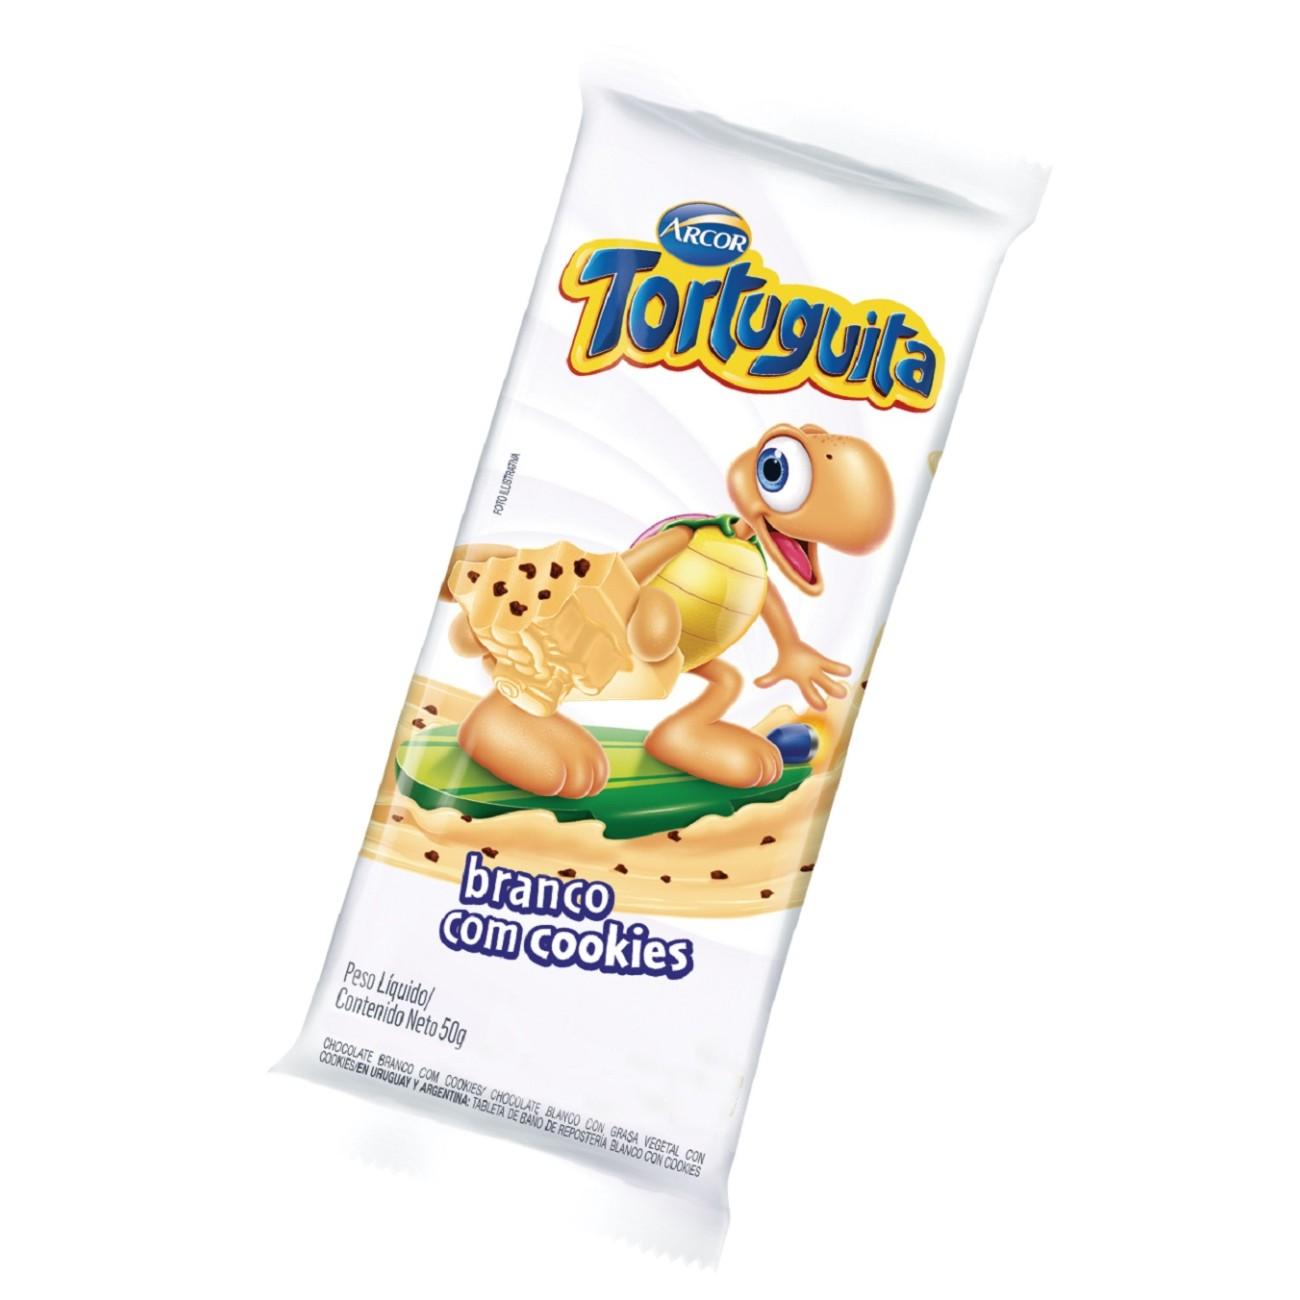 display de Tablete de Chocolate Tortuguita Branco com Cookies 50g (12 un/cada)